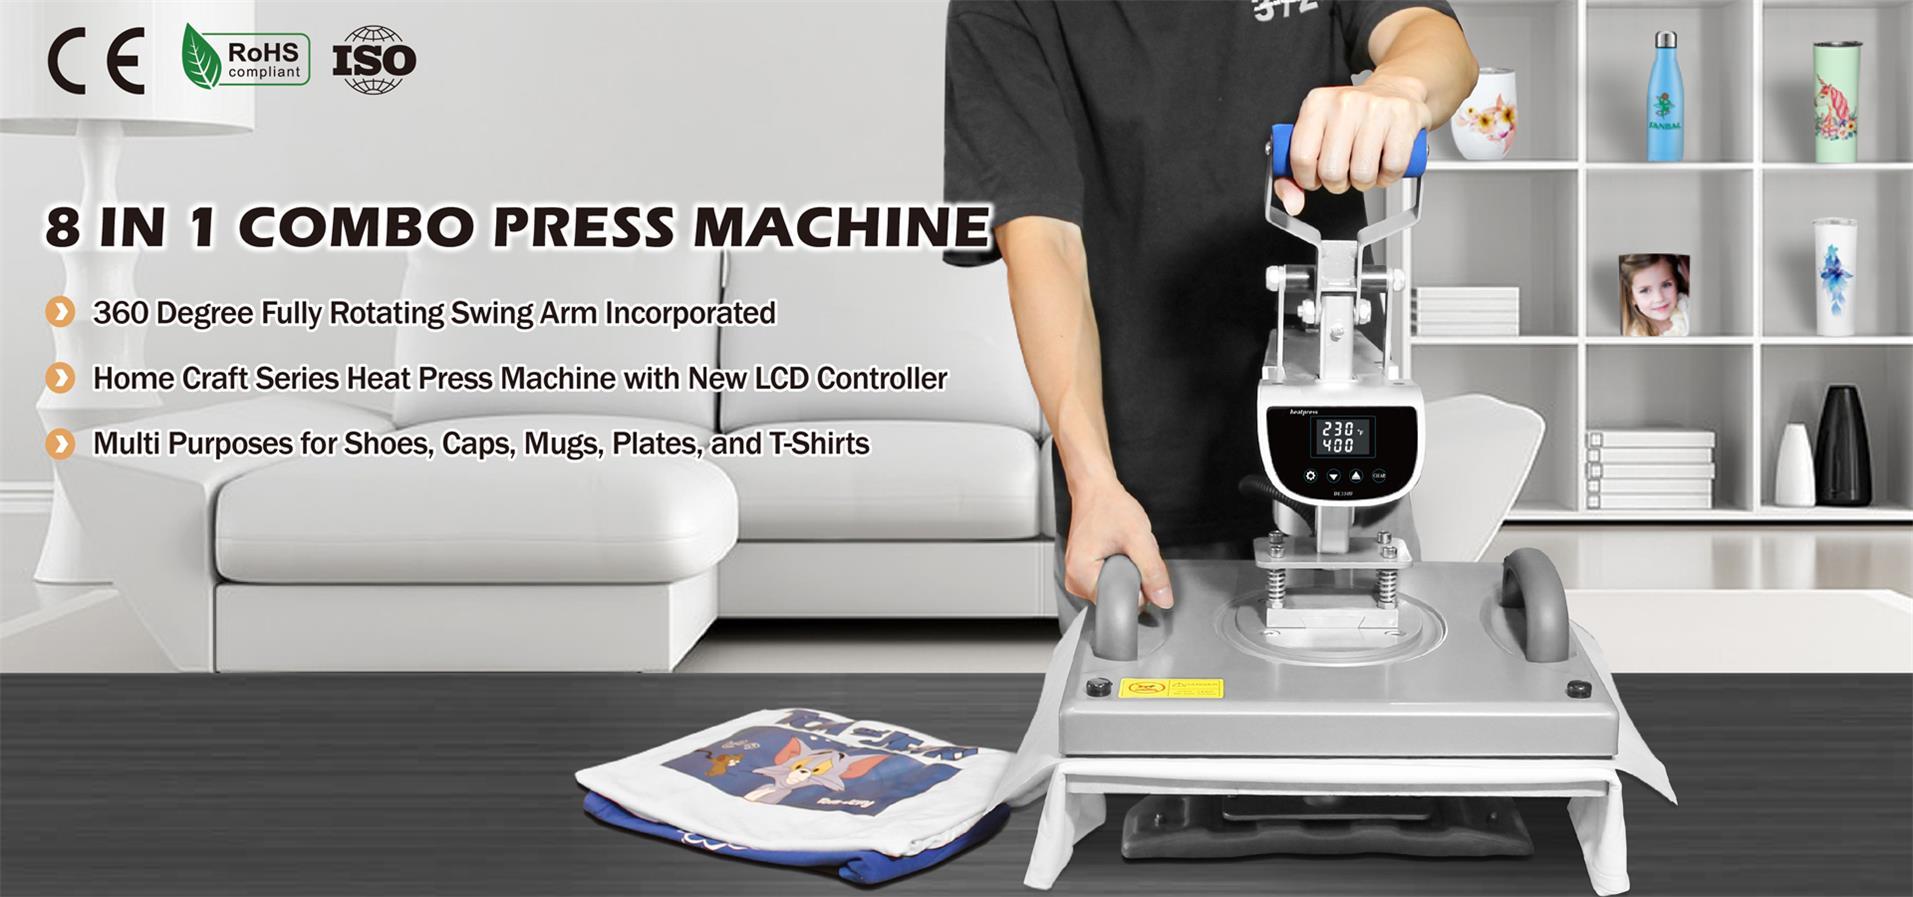 https://www.xheatpress.com/easytrans-15-x-15-8-in-1-sublimation-combo-heat-press-machine-8-in-1-product/